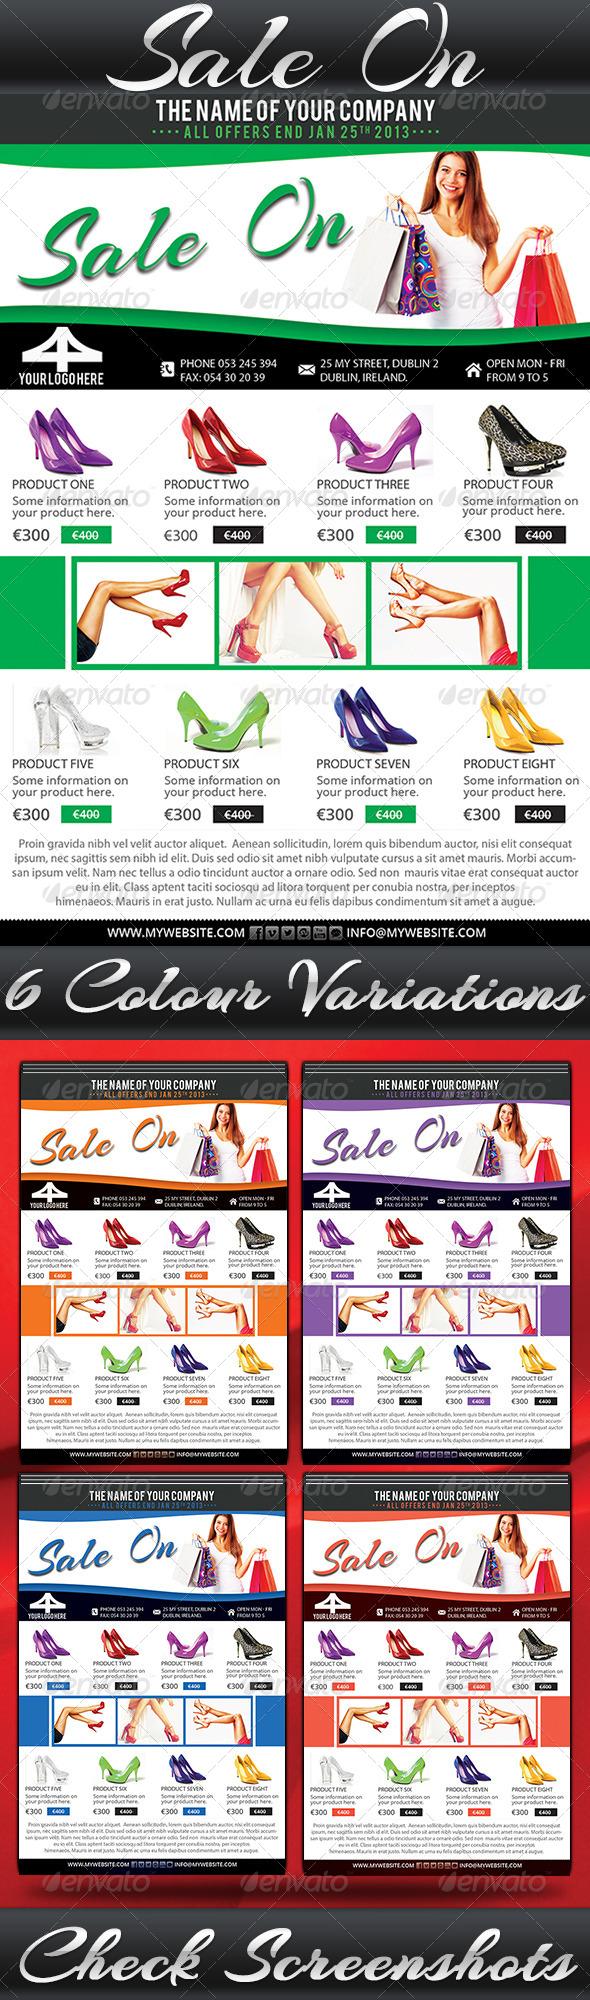 Sale On Flyer - Flyers Print Templates